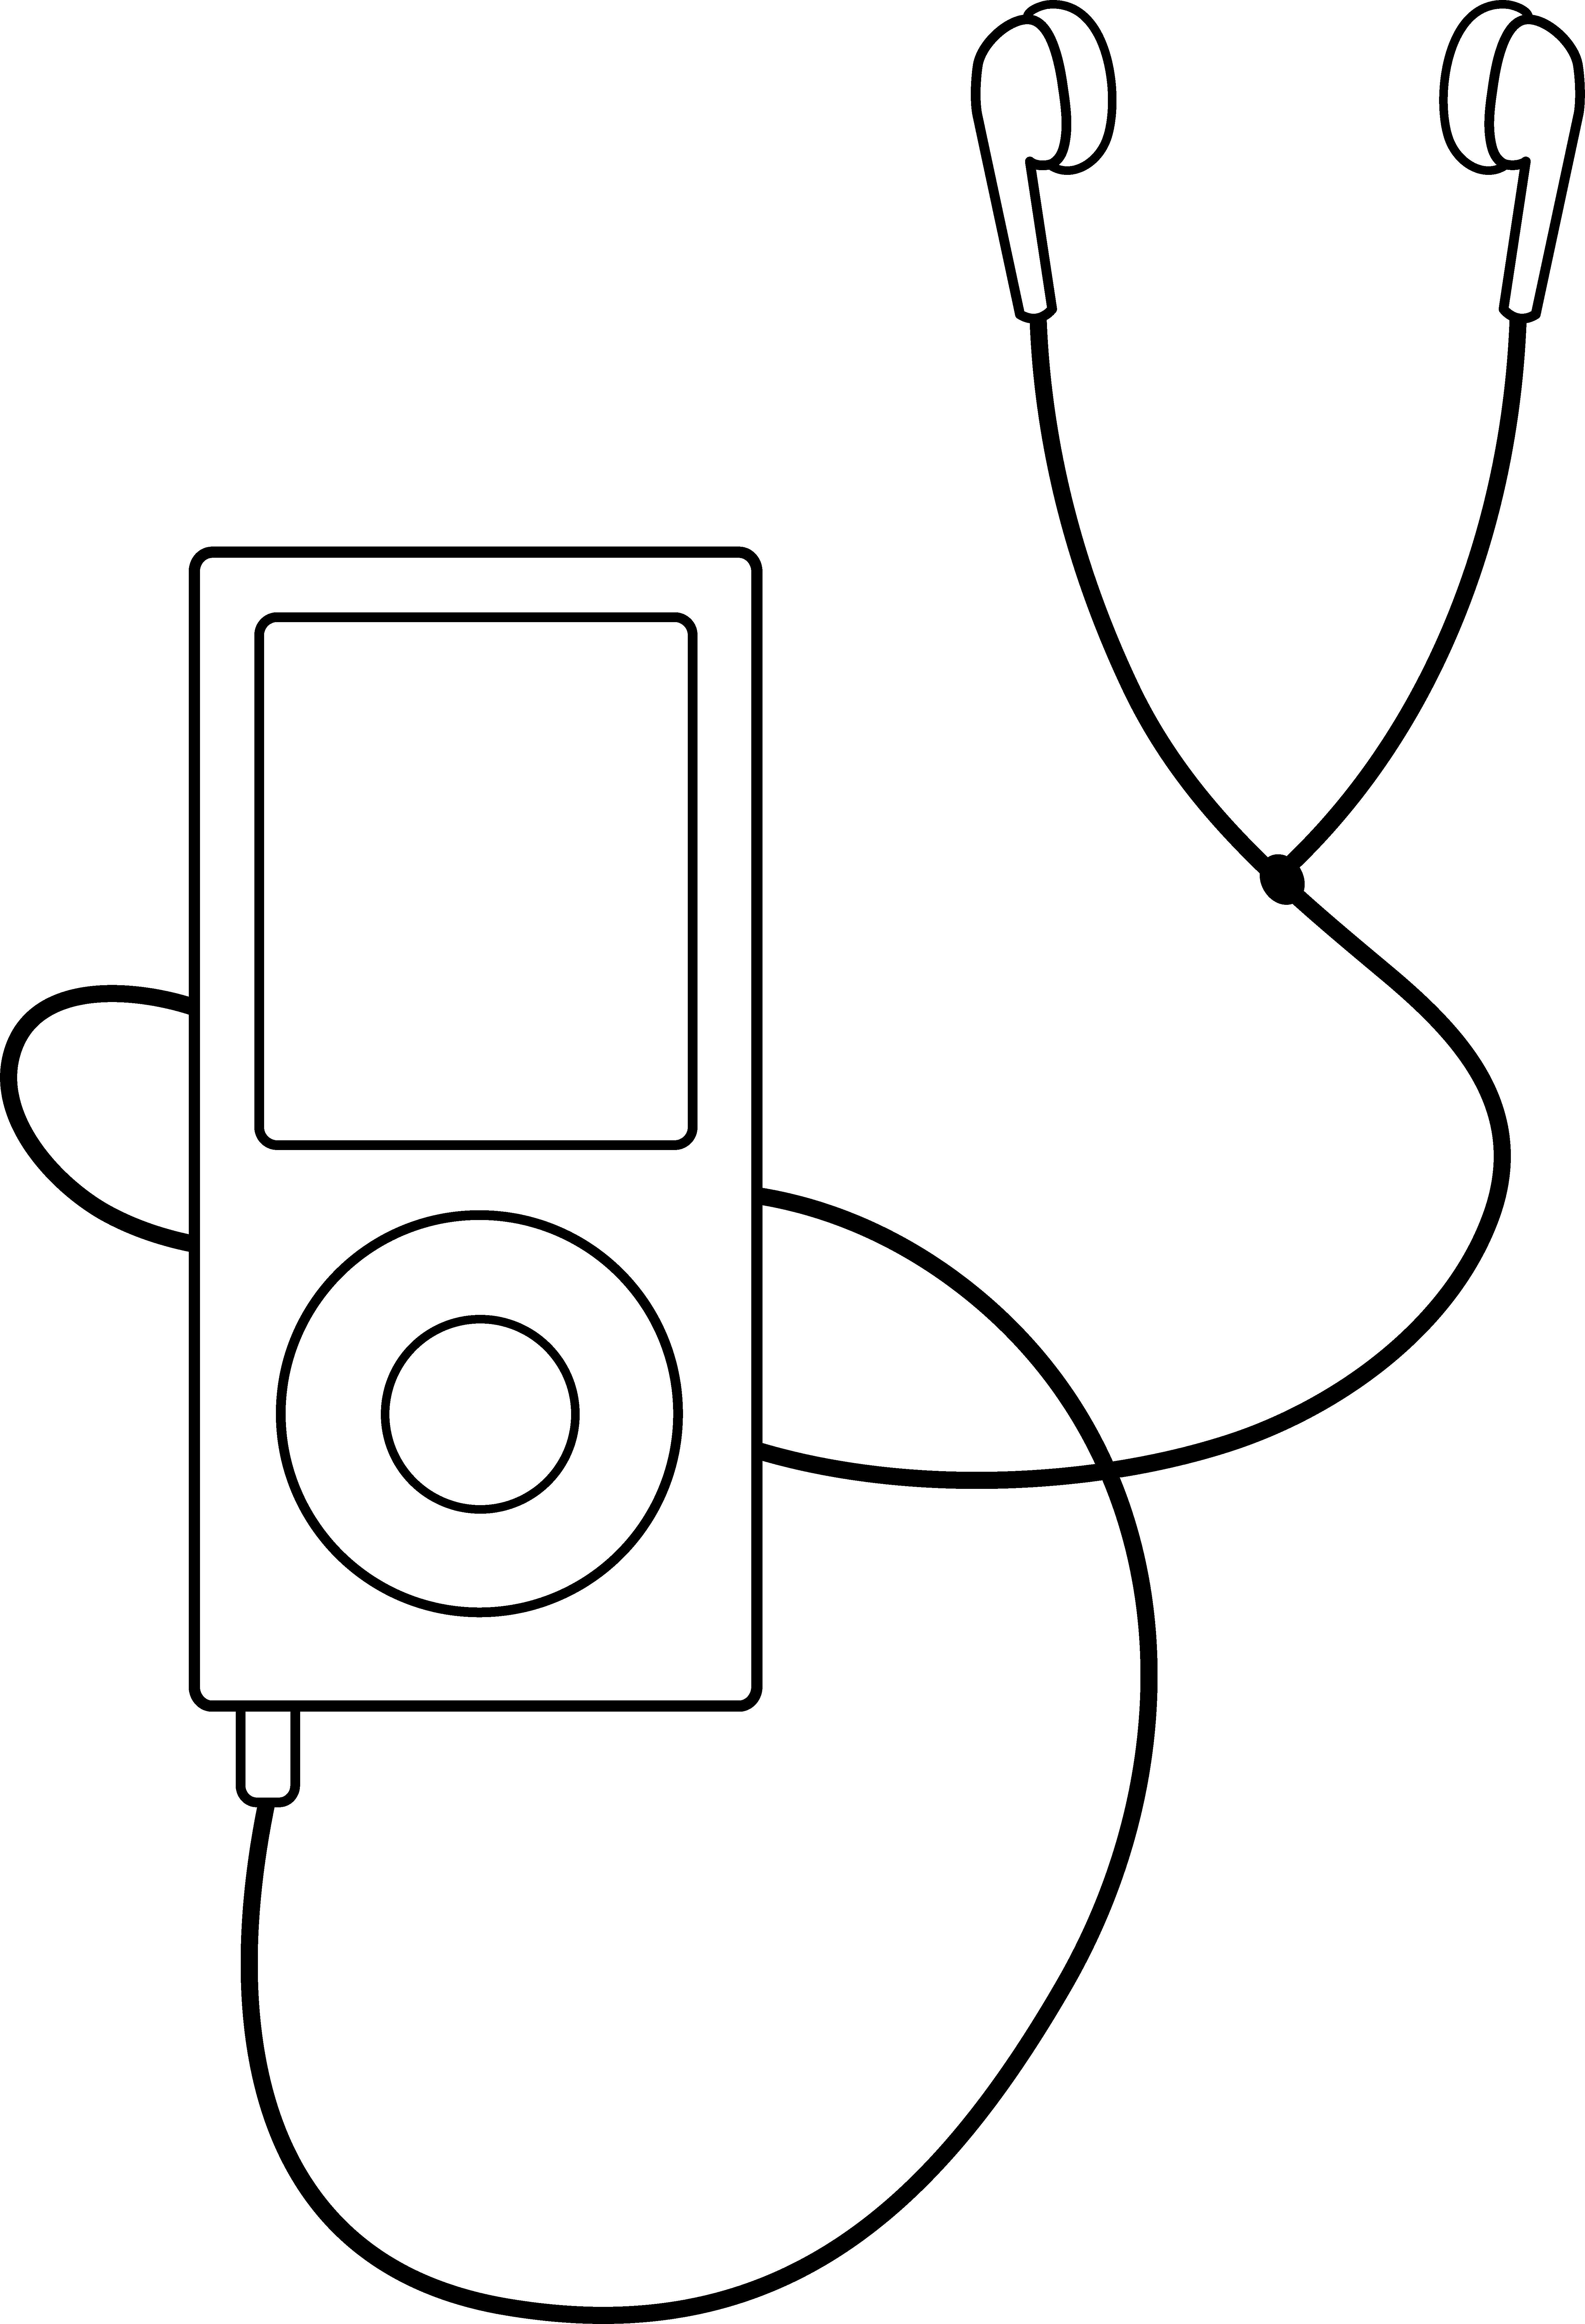 Earbuds and Headphones Clip Art.